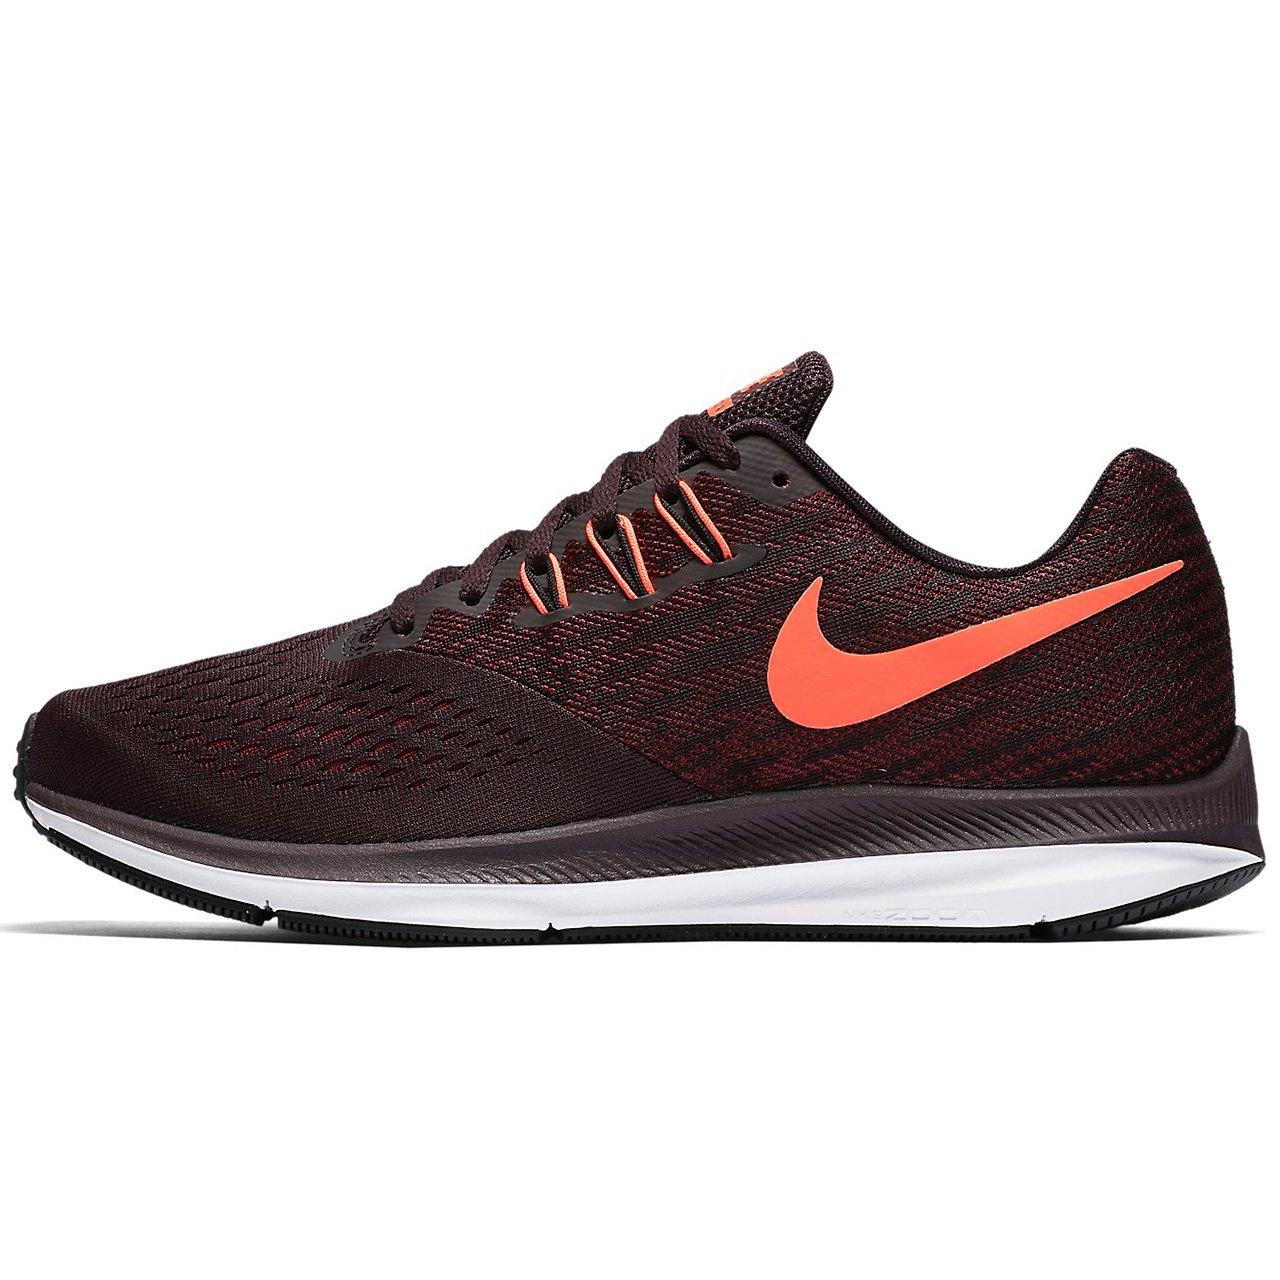 united kingdom shop best sellers latest Nike Men's Air Zoom Winflo 4 Running Shoe, Port Wine/Total Crimson-Team  Red-Black, 10